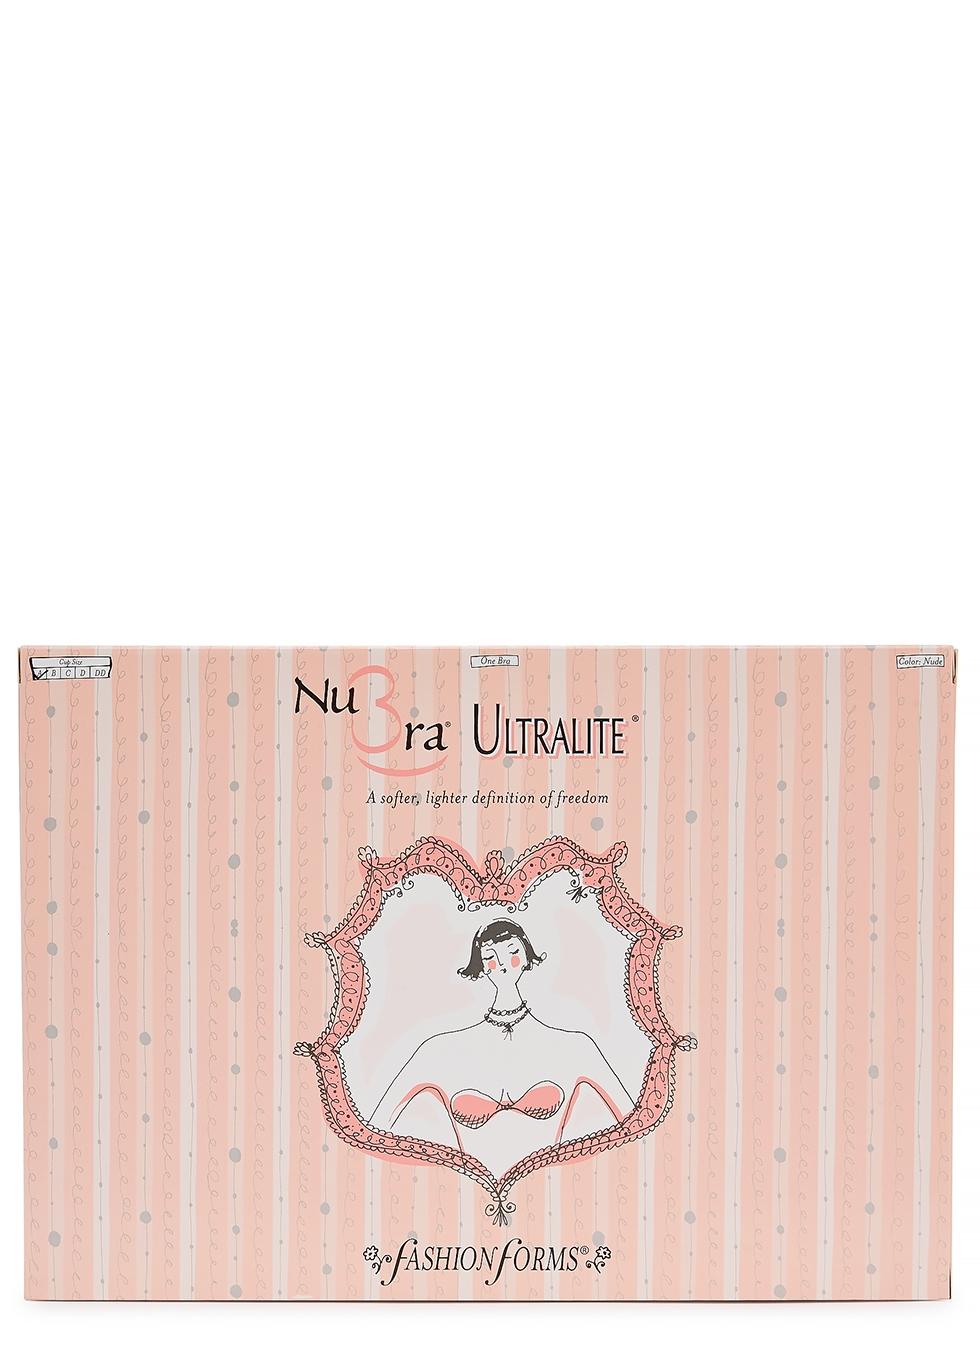 NuBra Ultralite adhesive bra